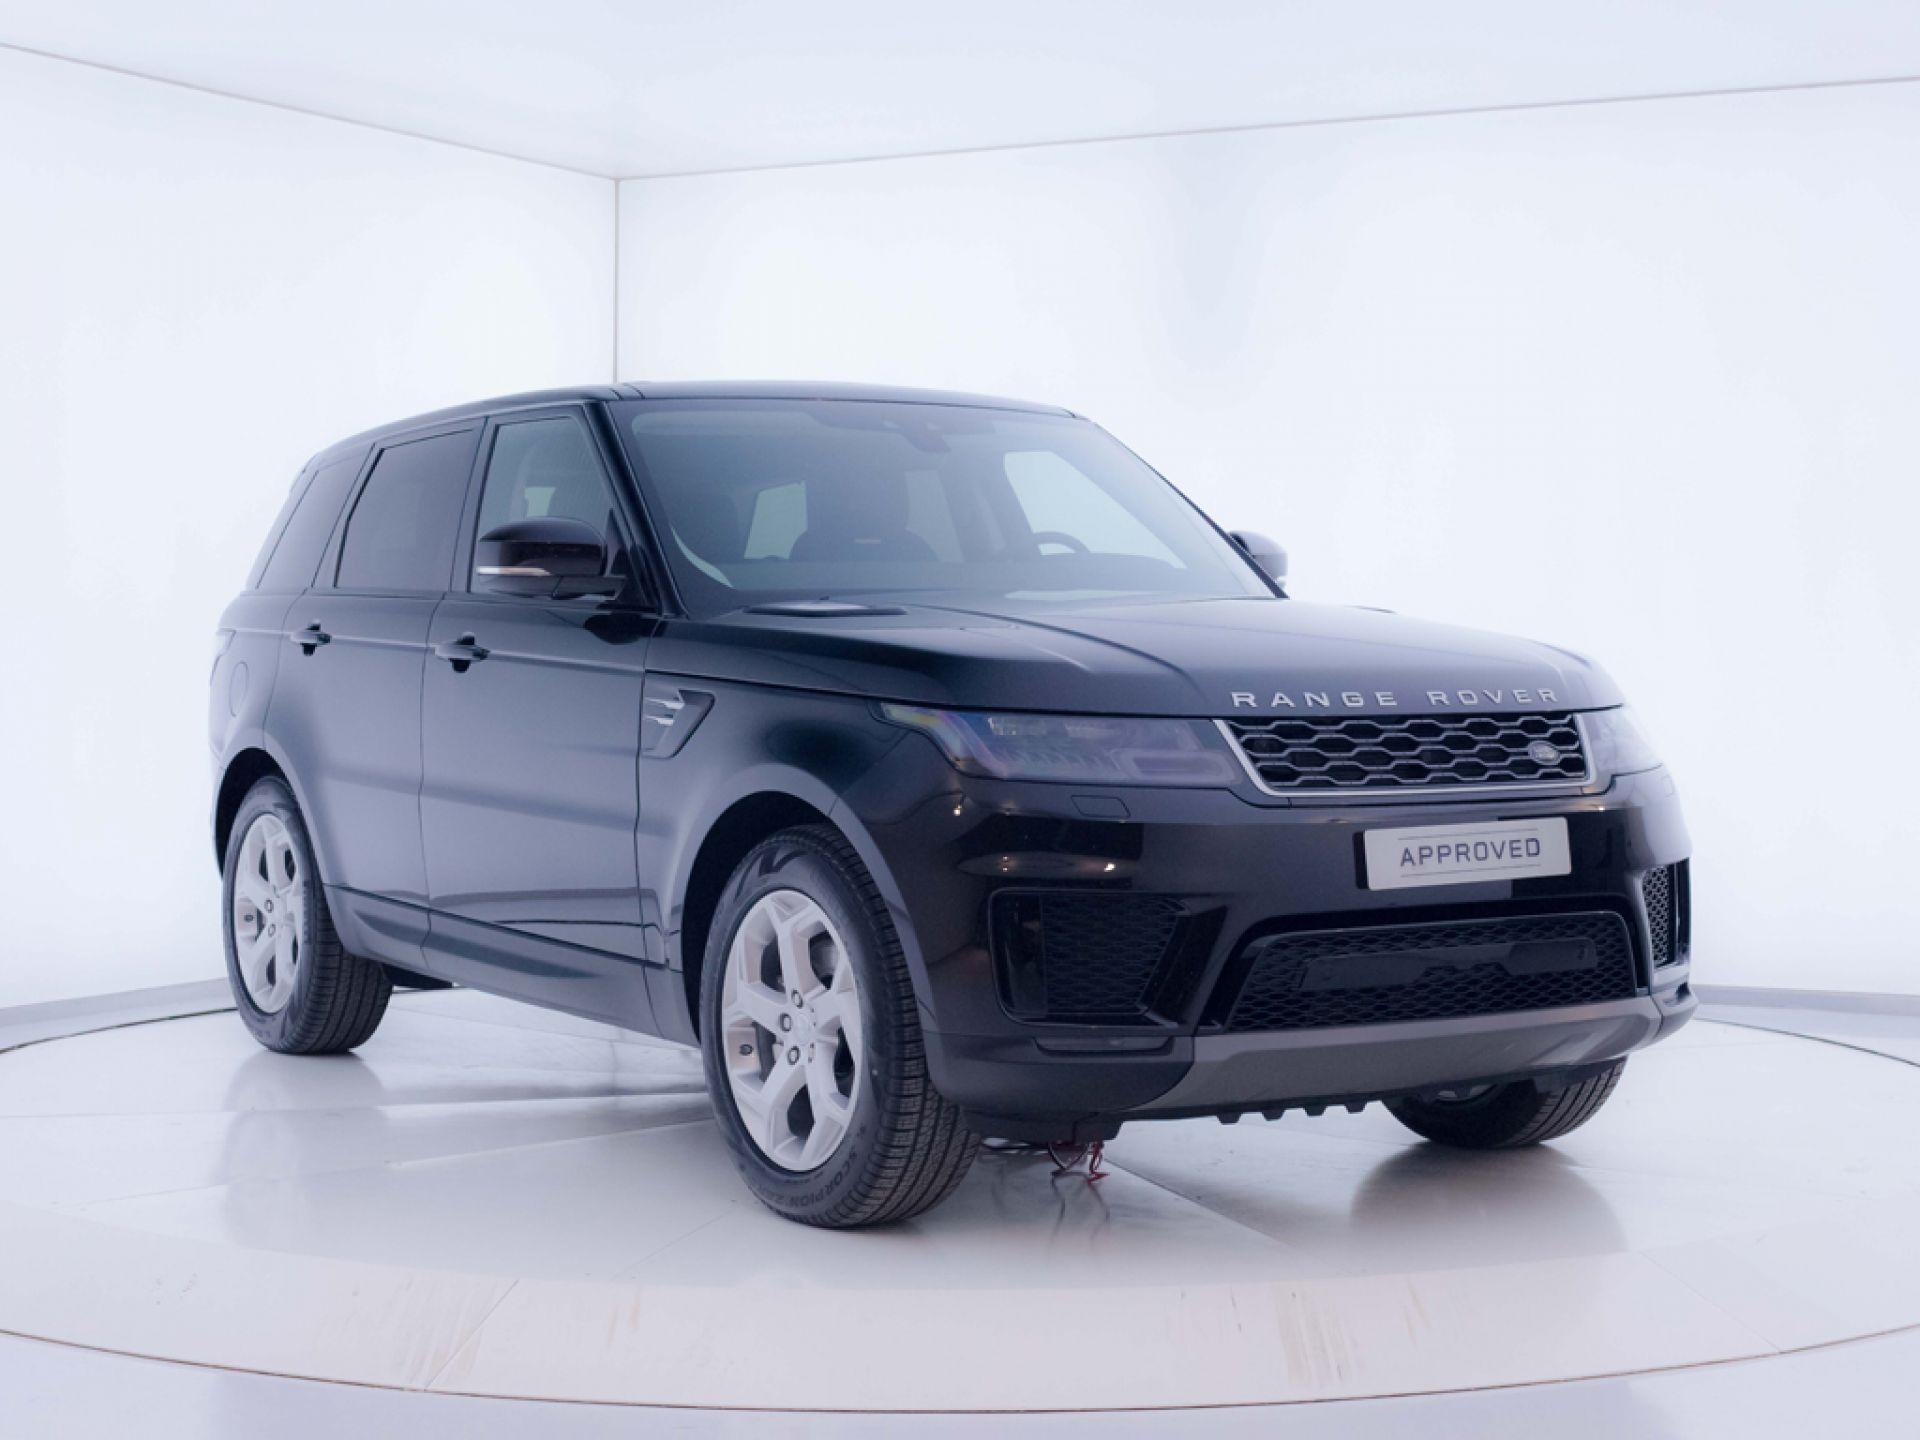 Land Rover Range Rover Sport 3.0 SDV6 (249CV) S